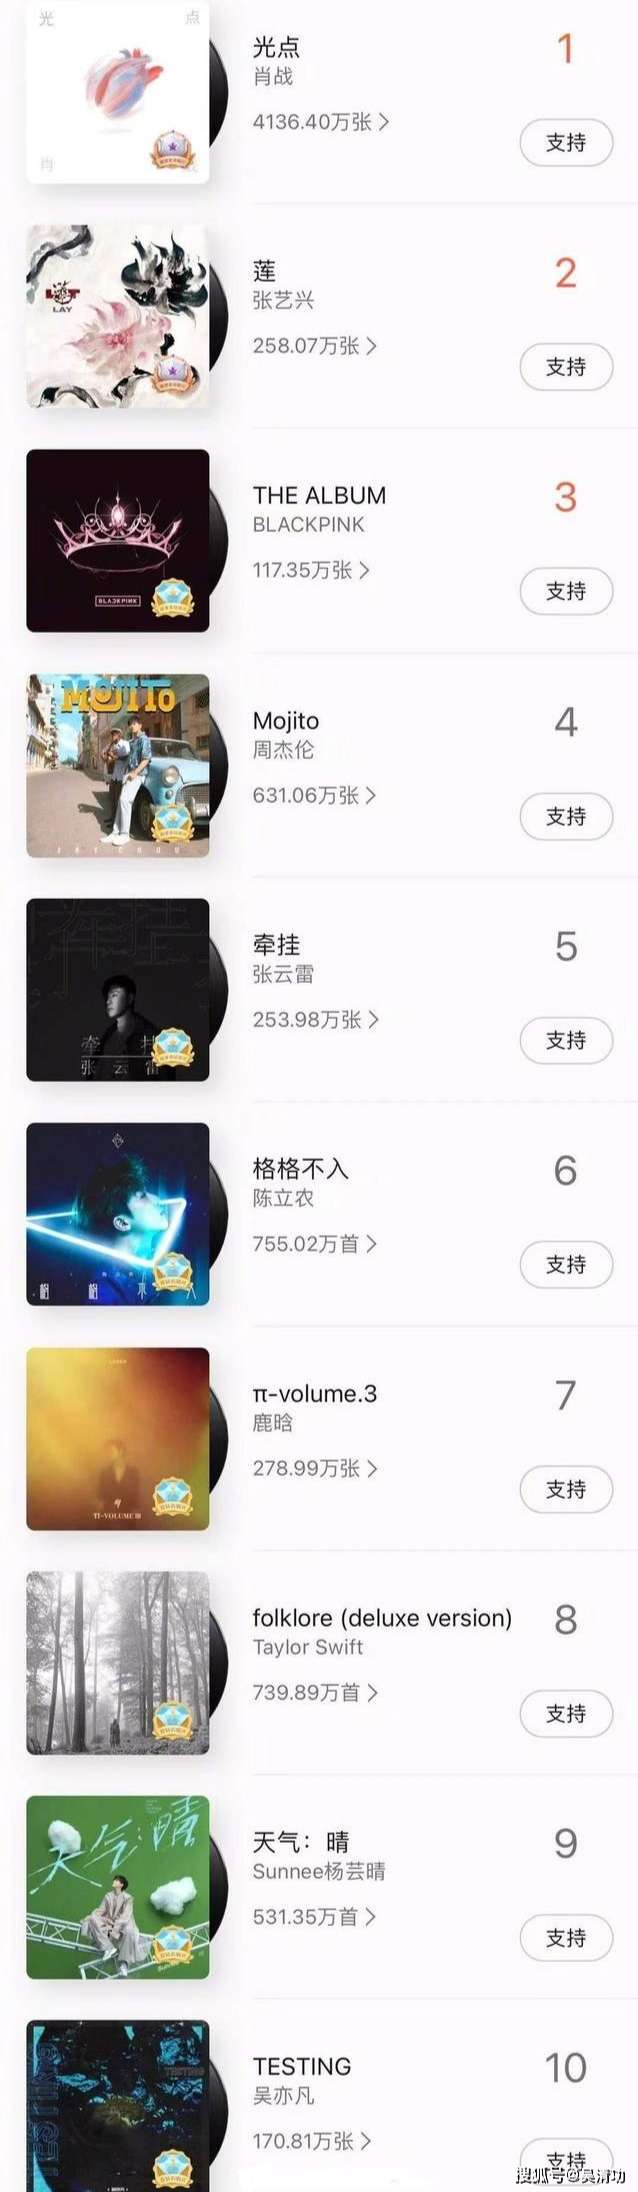 xiao zhan top 10 best seller album 2020 qq music